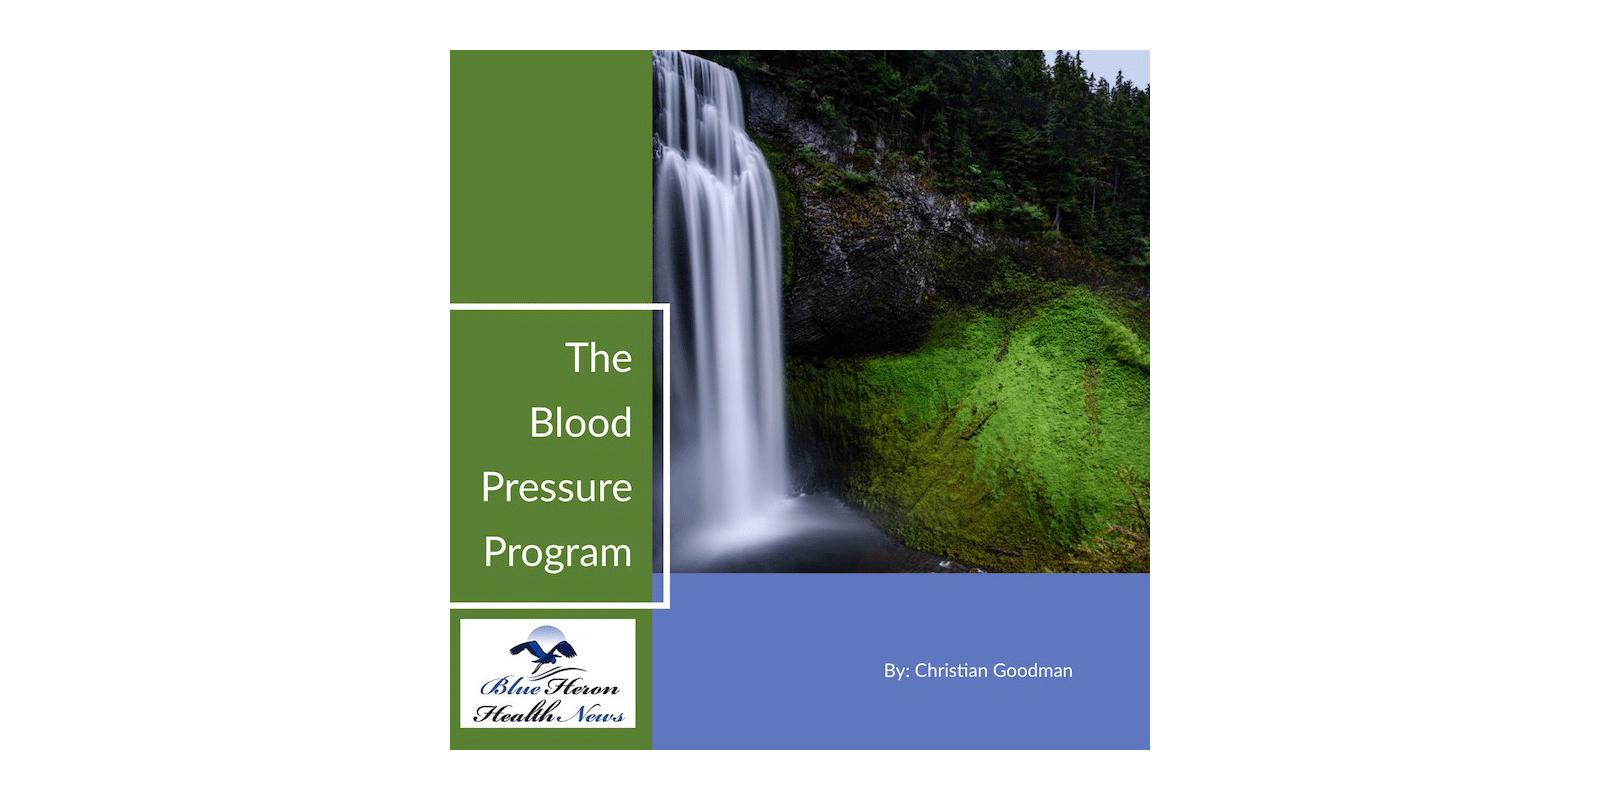 The-Blood-Pressure-Program-Reviews